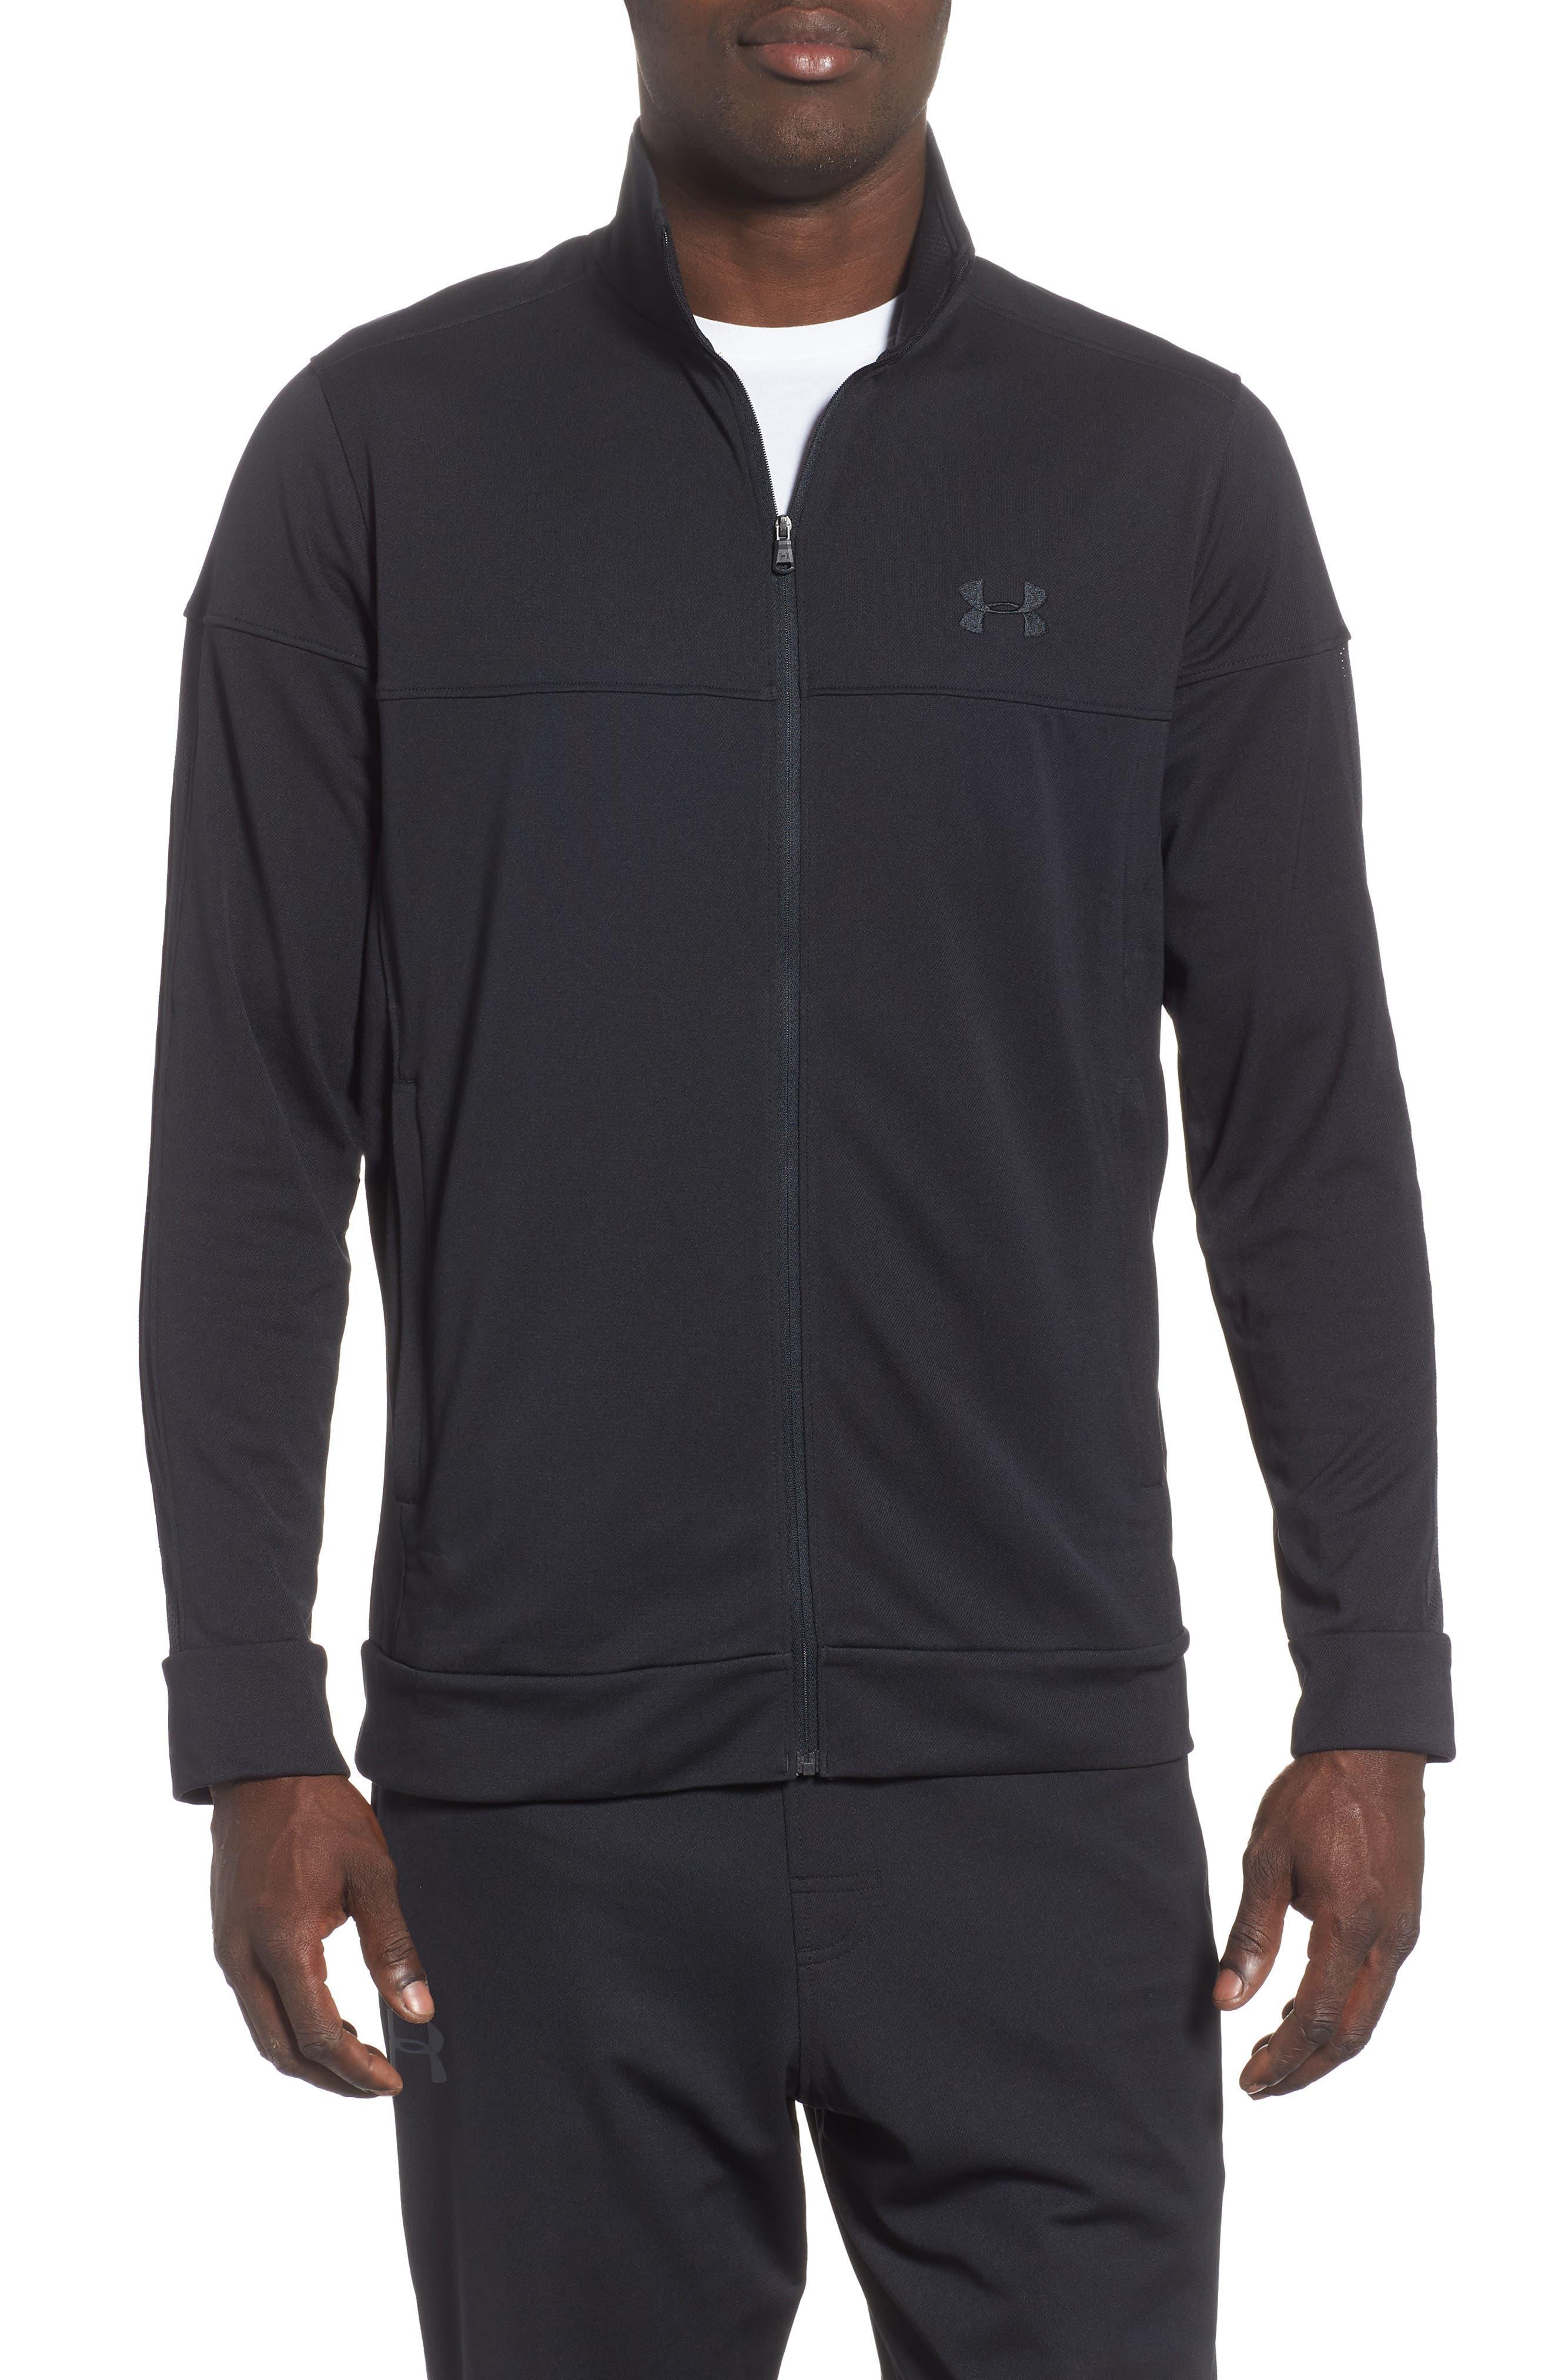 Sportstyle Piqué Track Jacket,                             Main thumbnail 1, color,                             BLACK / / BLACK